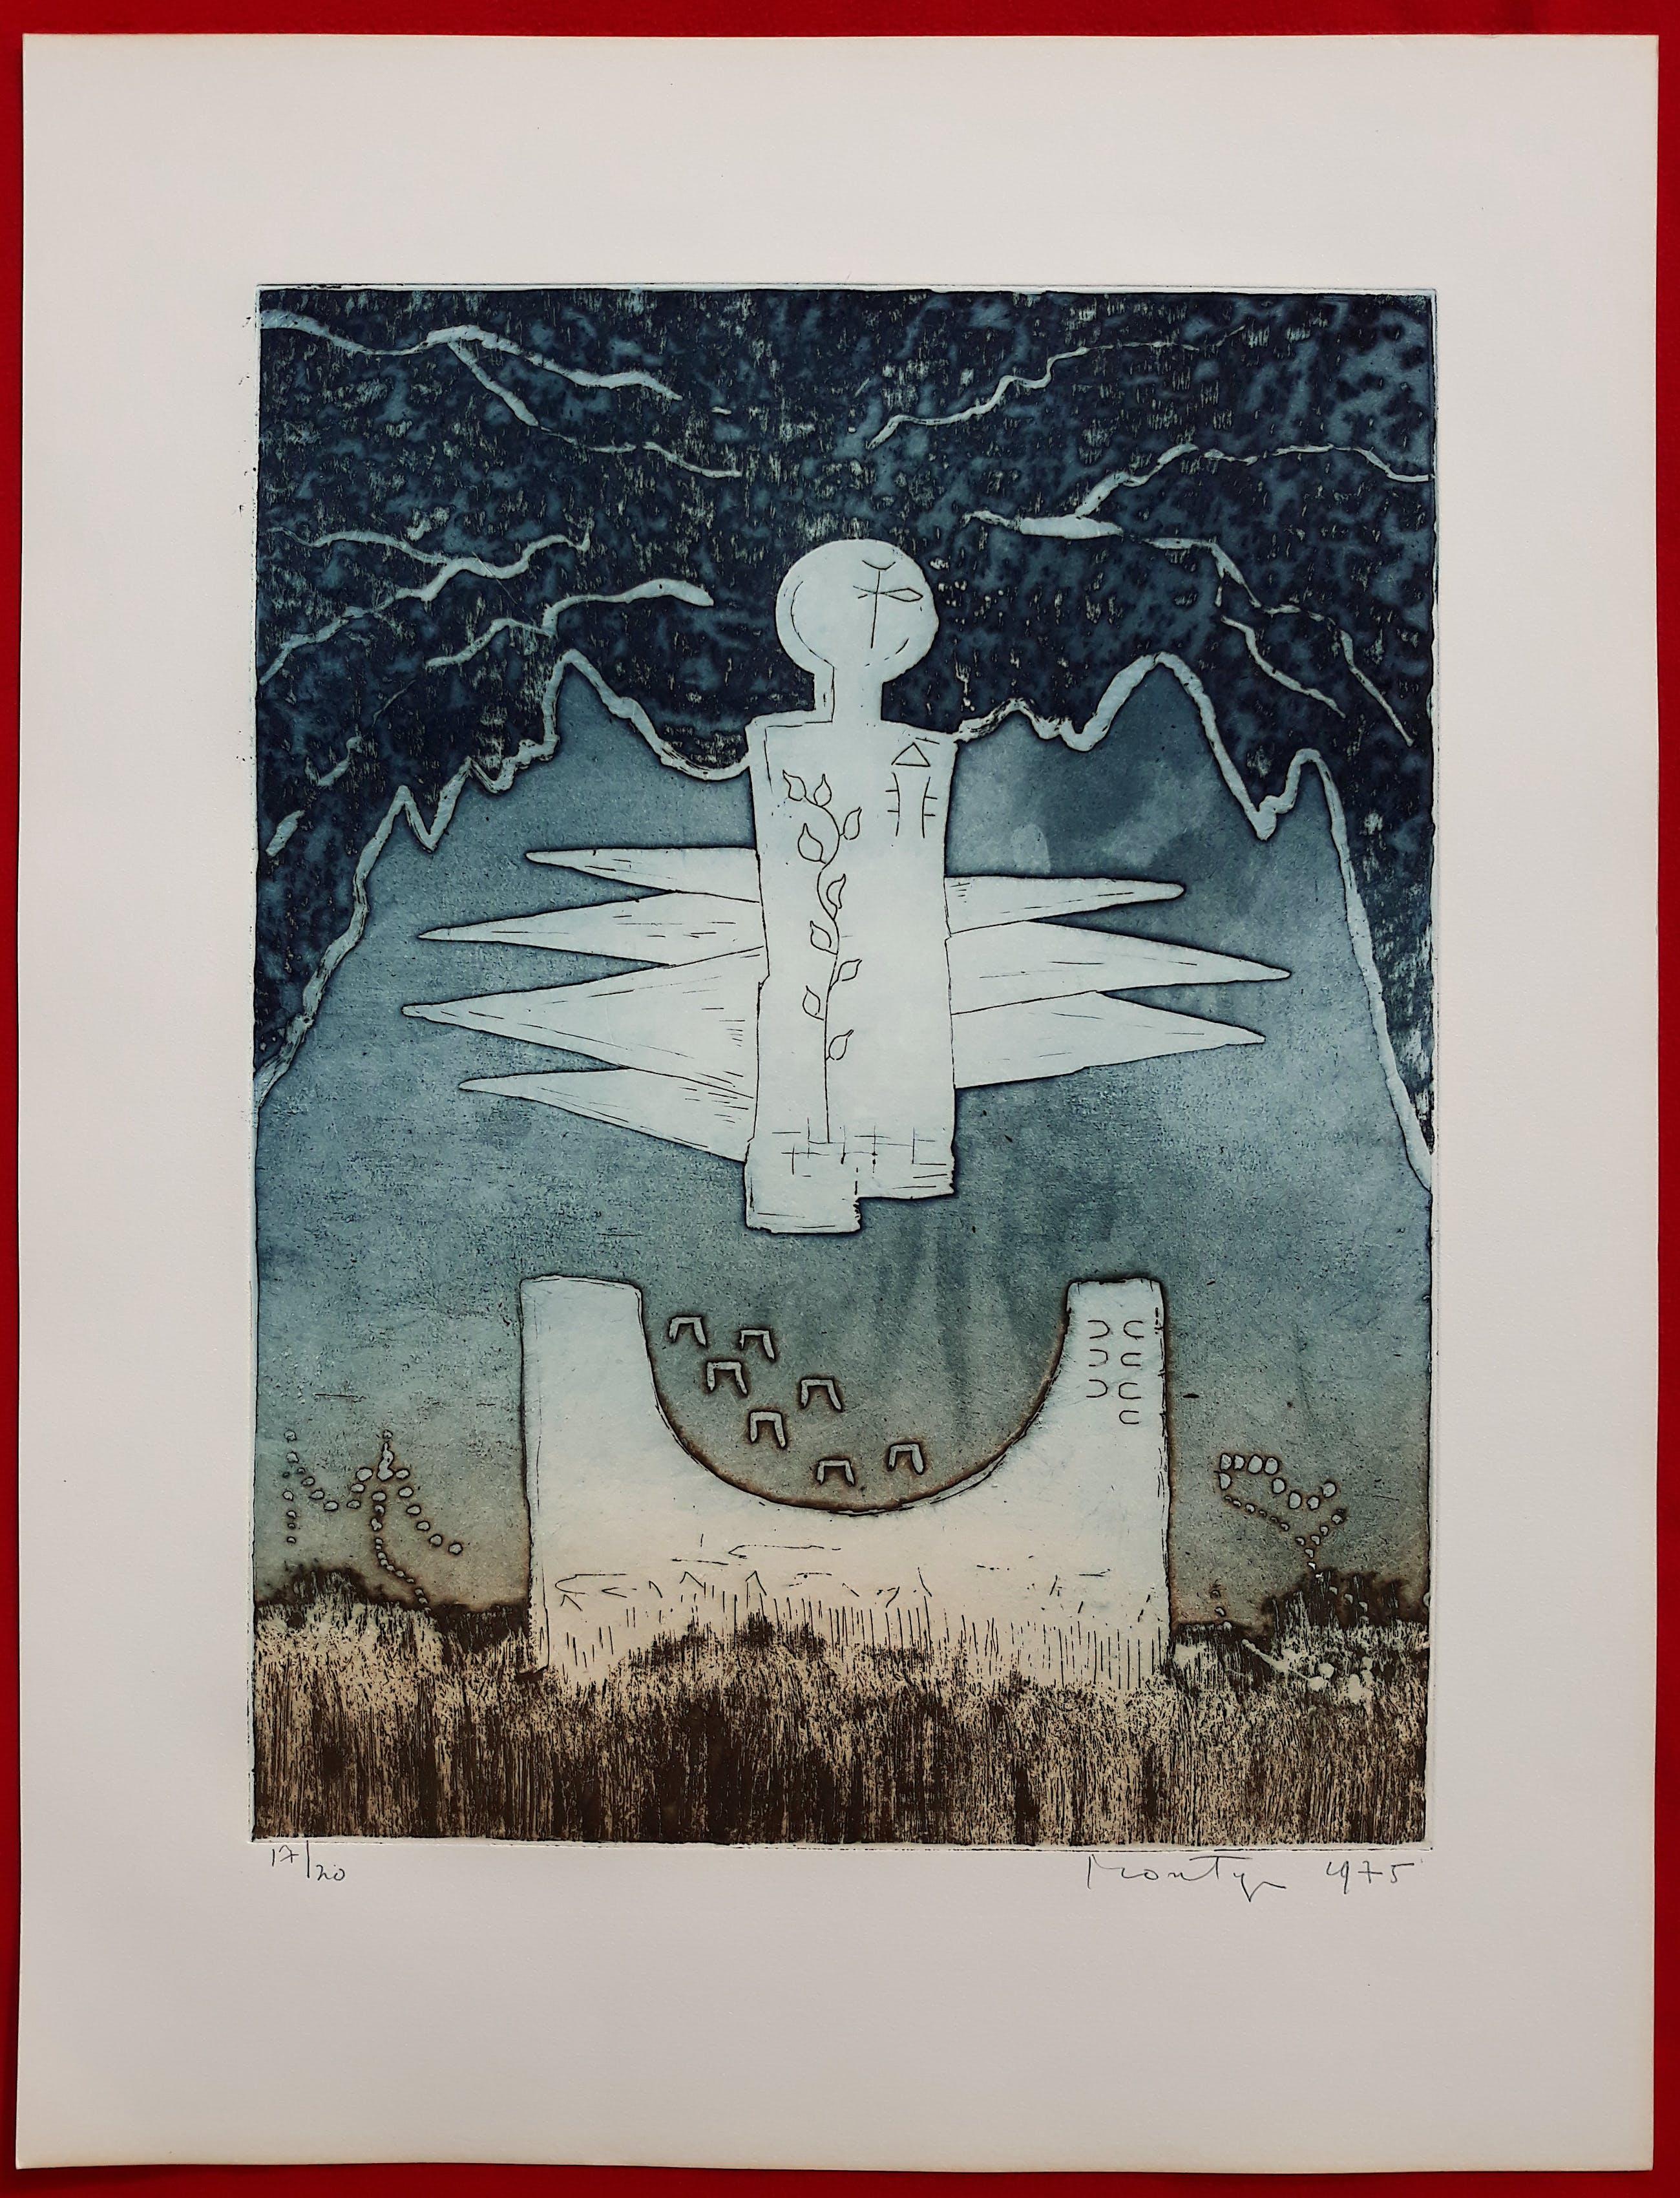 Jan Montyn - Chonyid Bardo - Illusion, aquatint ets (kleine oplage) kopen? Bied vanaf 115!